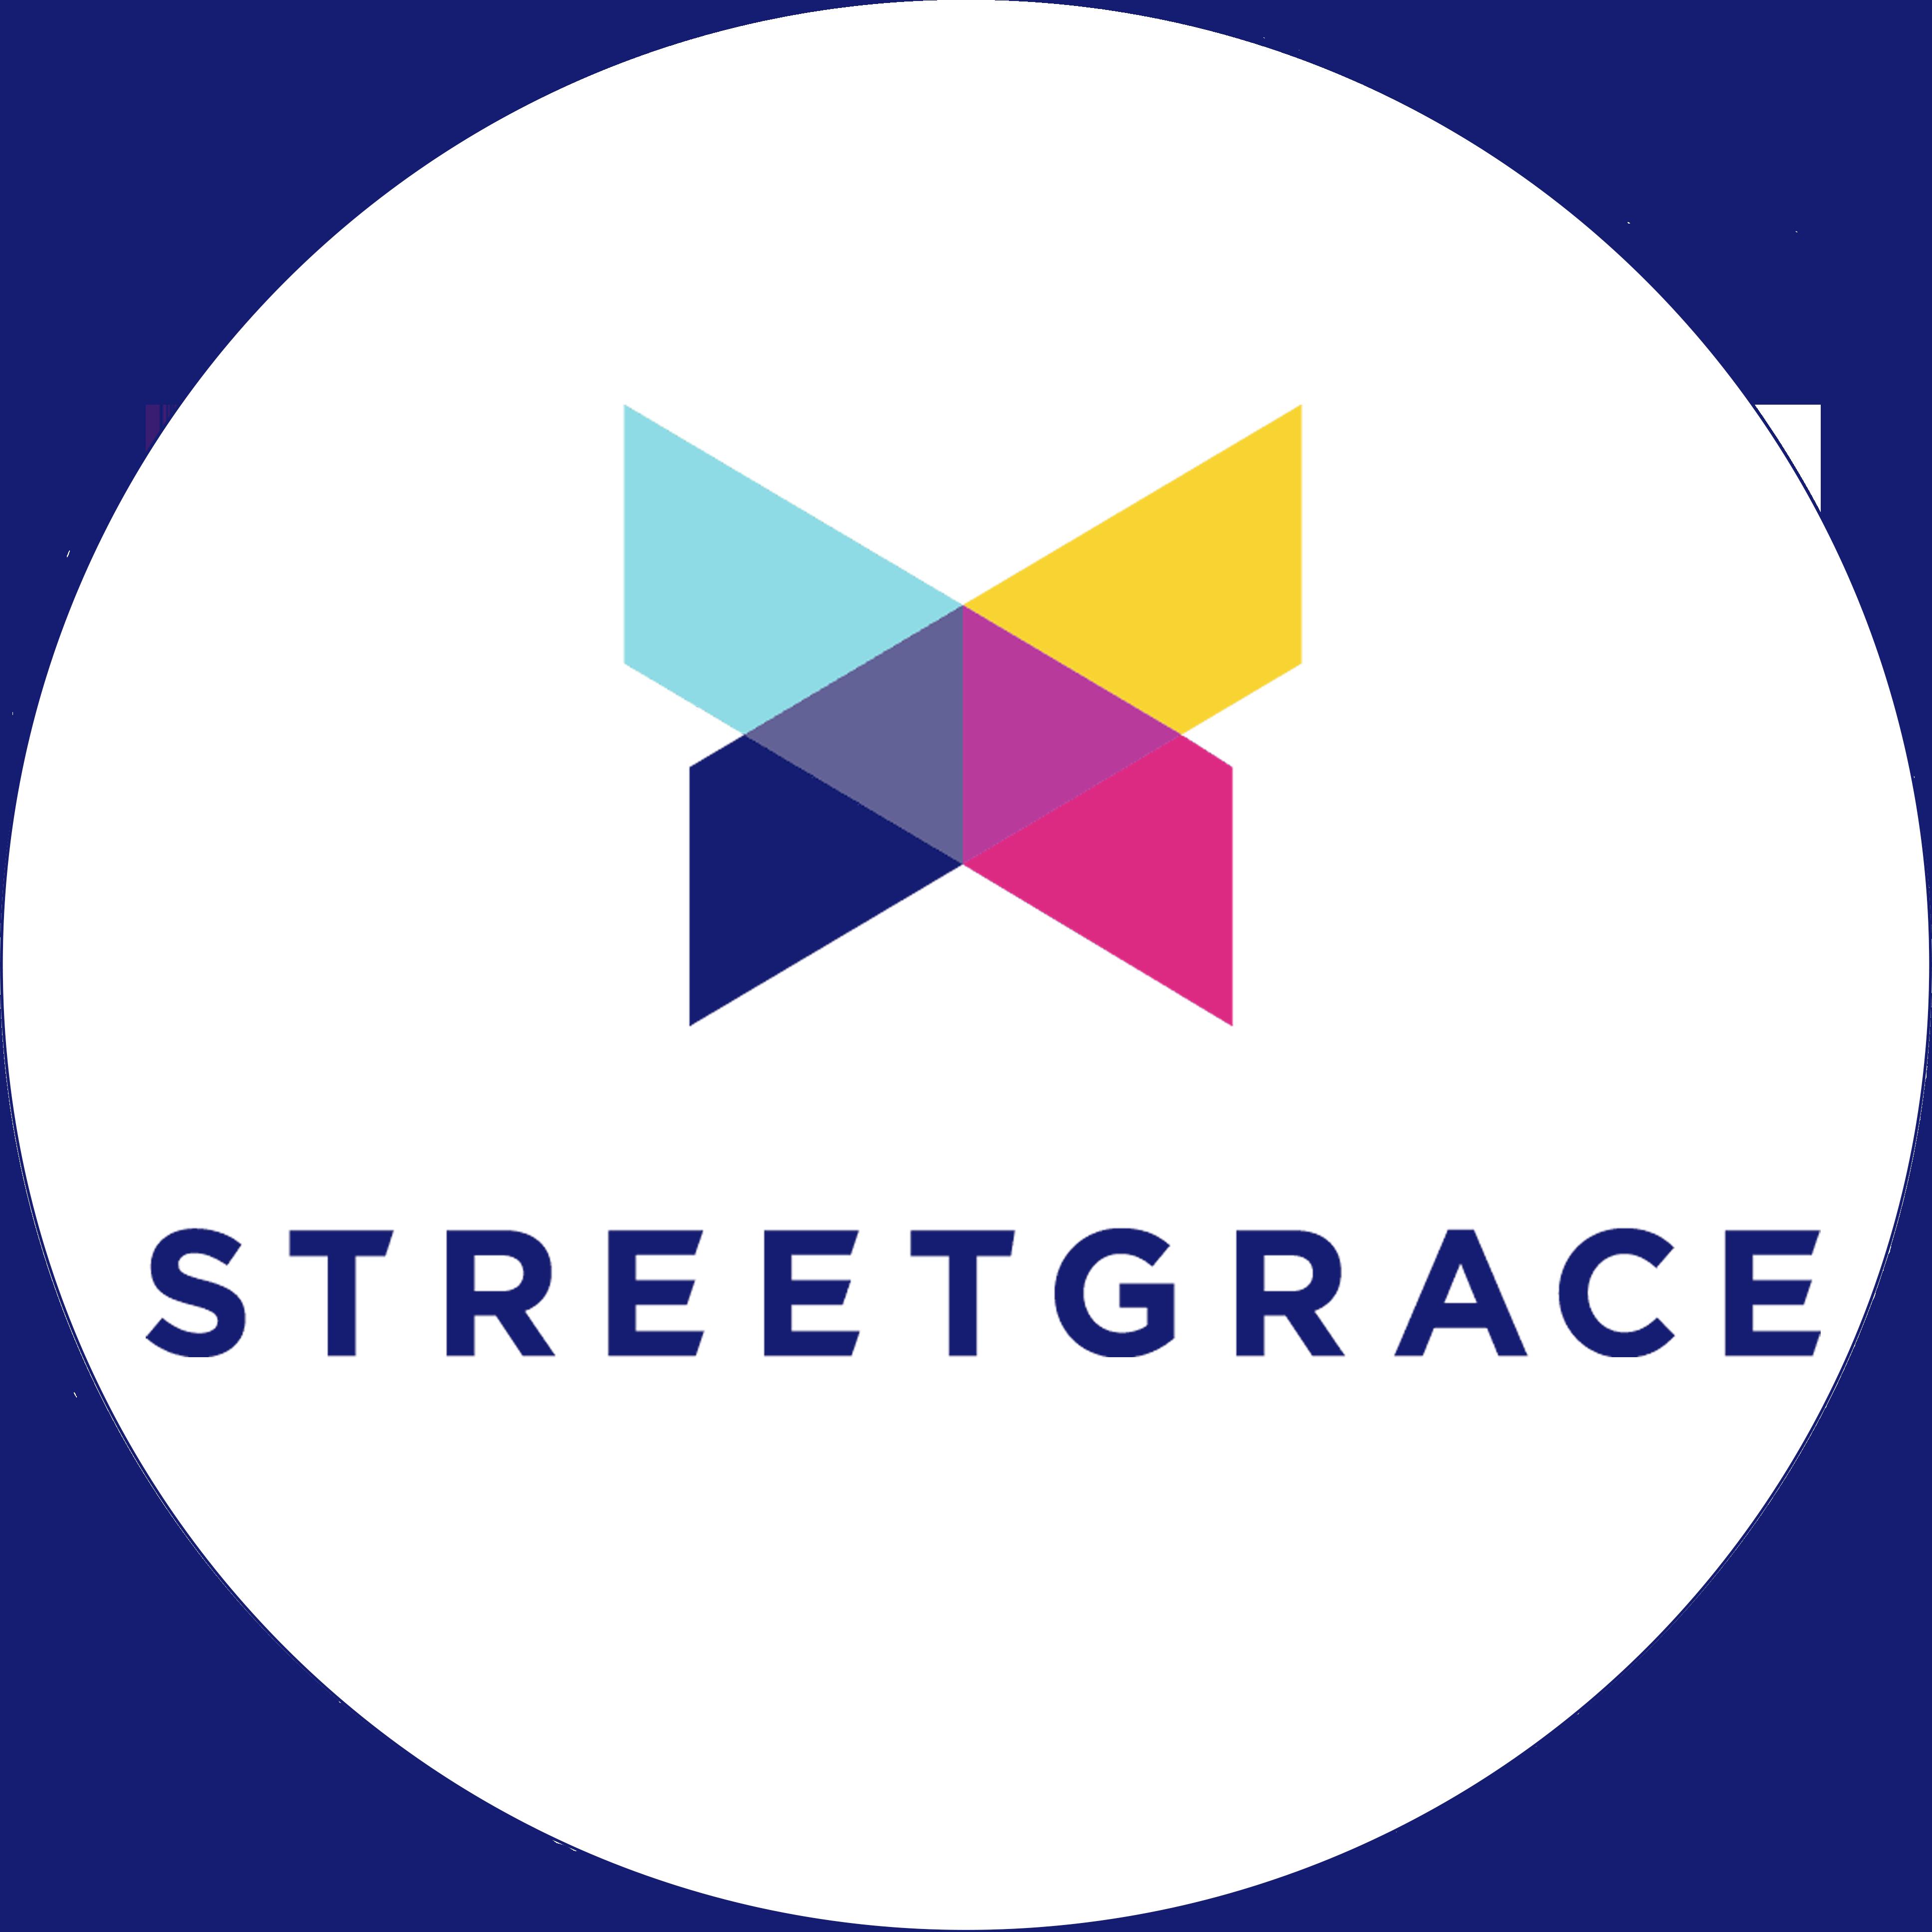 streetgrace-logo